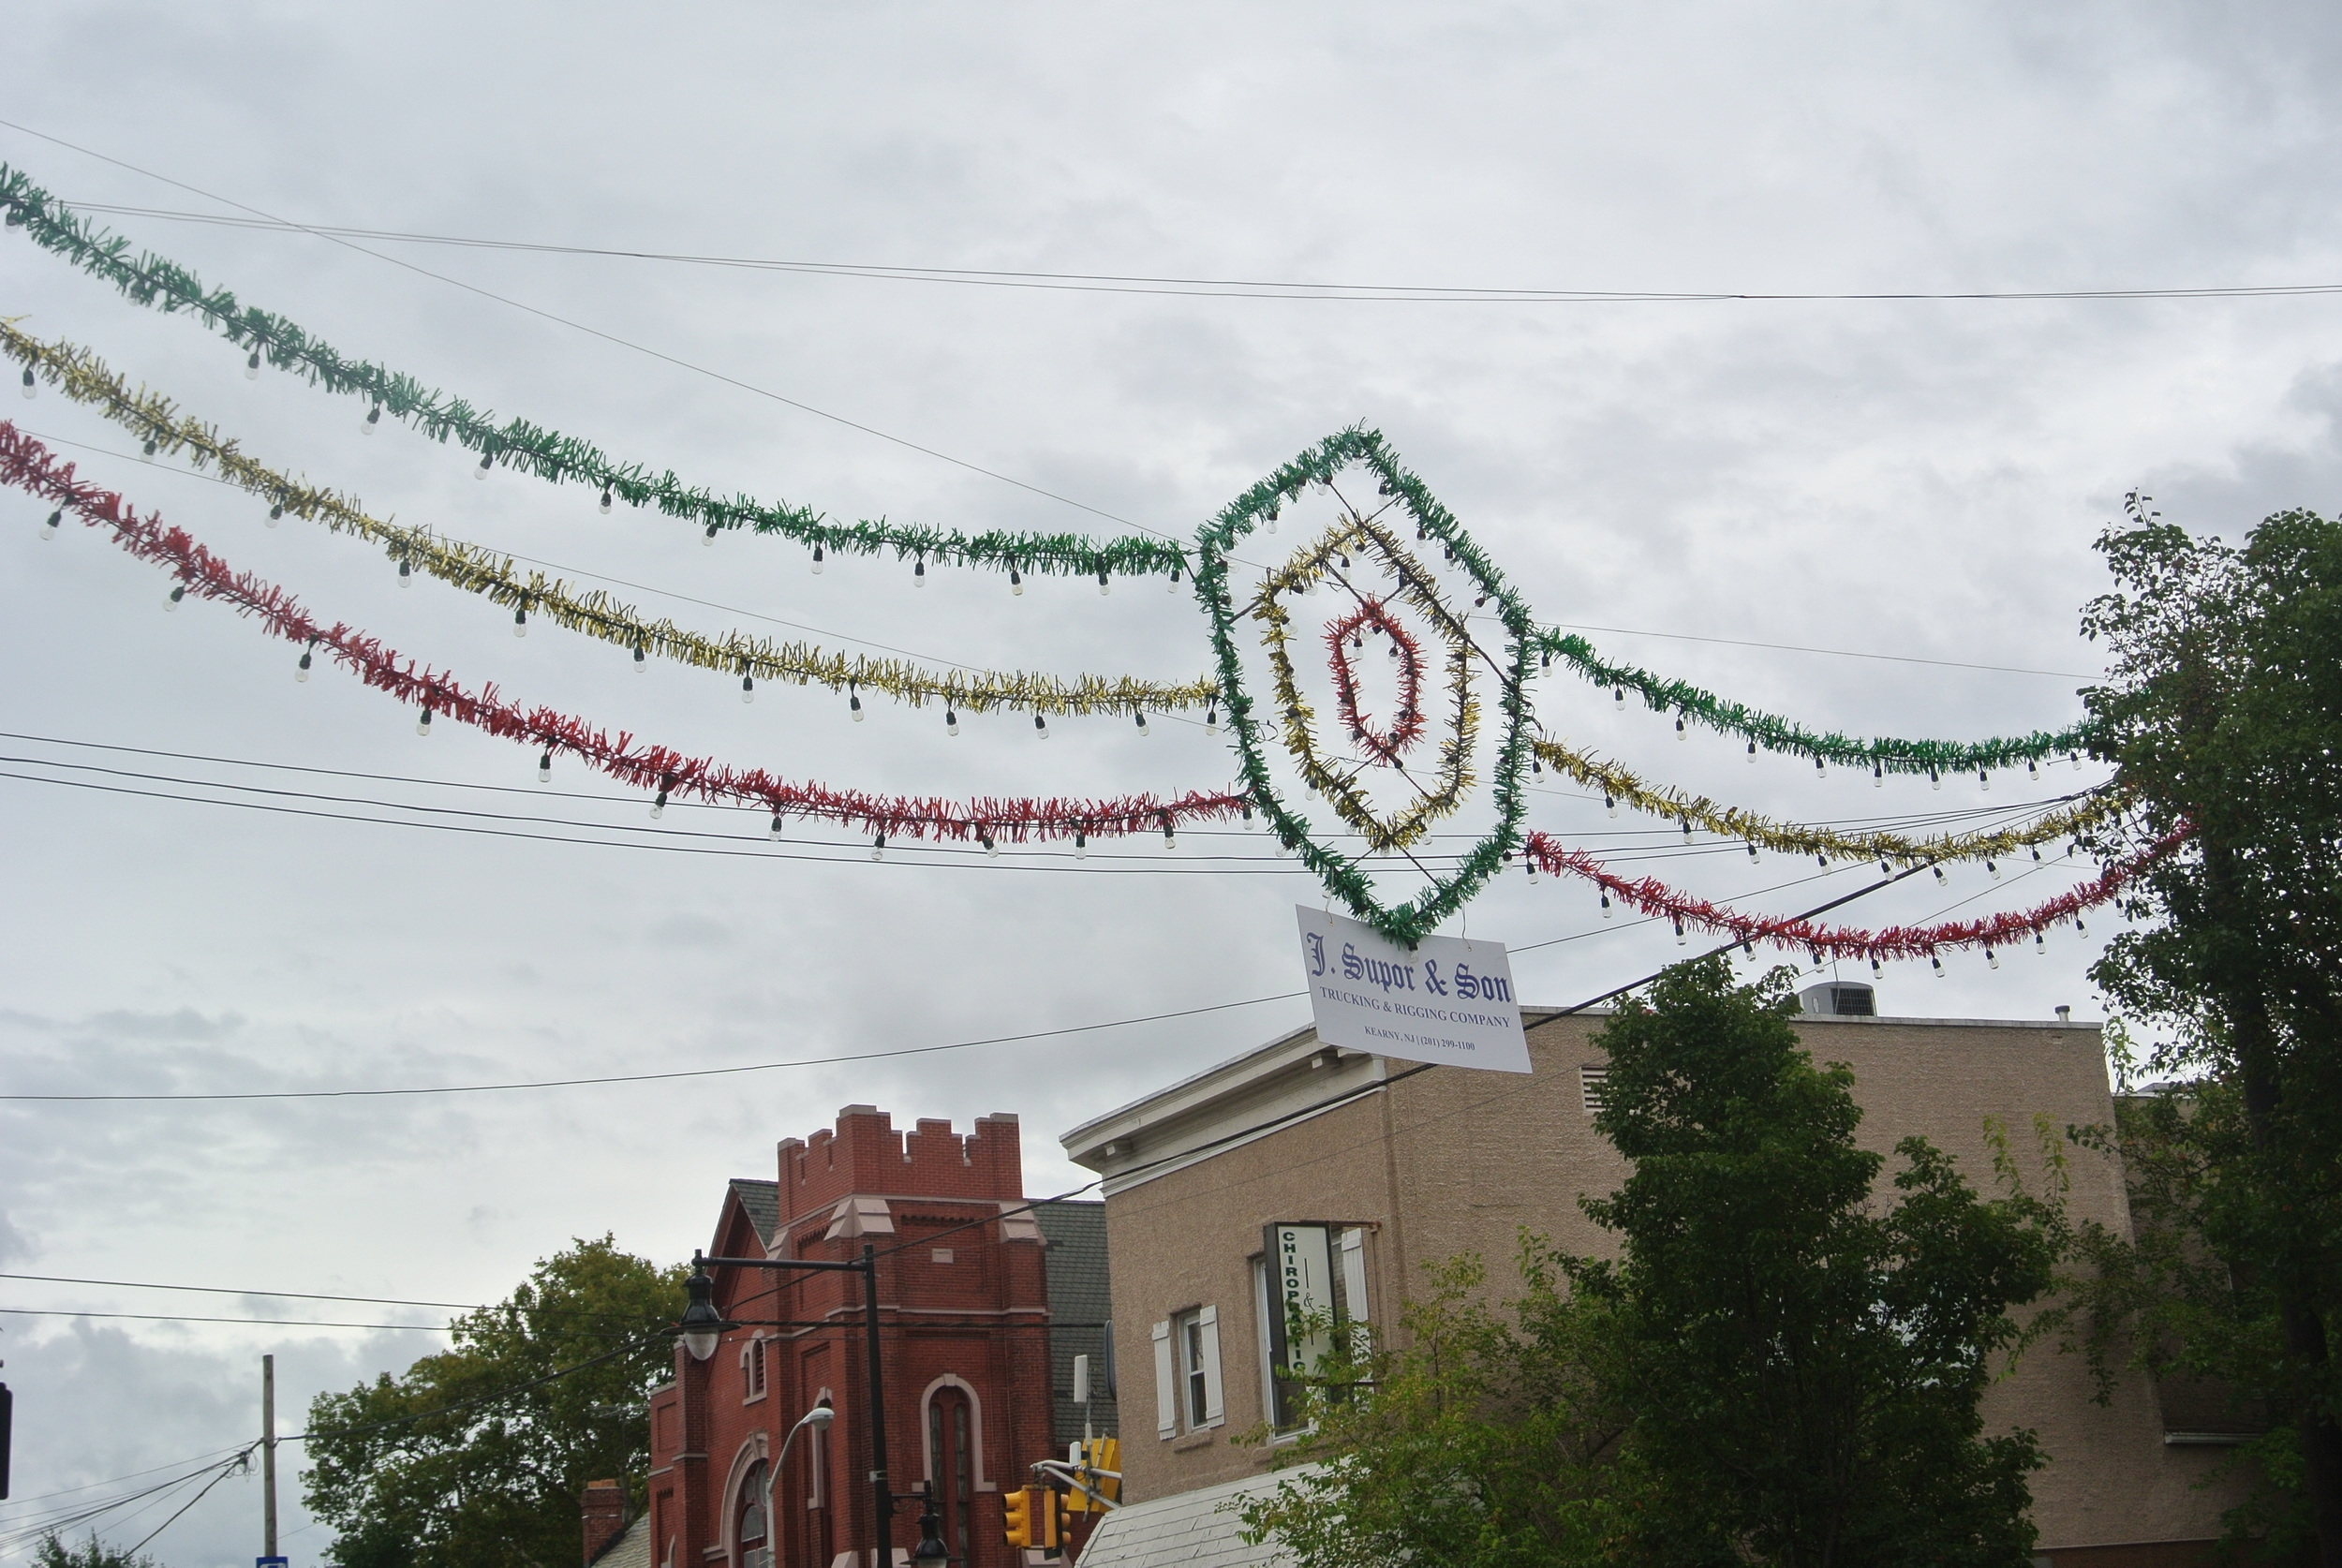 J. Supor & Son Arch for Harrison's 175th Anniversary